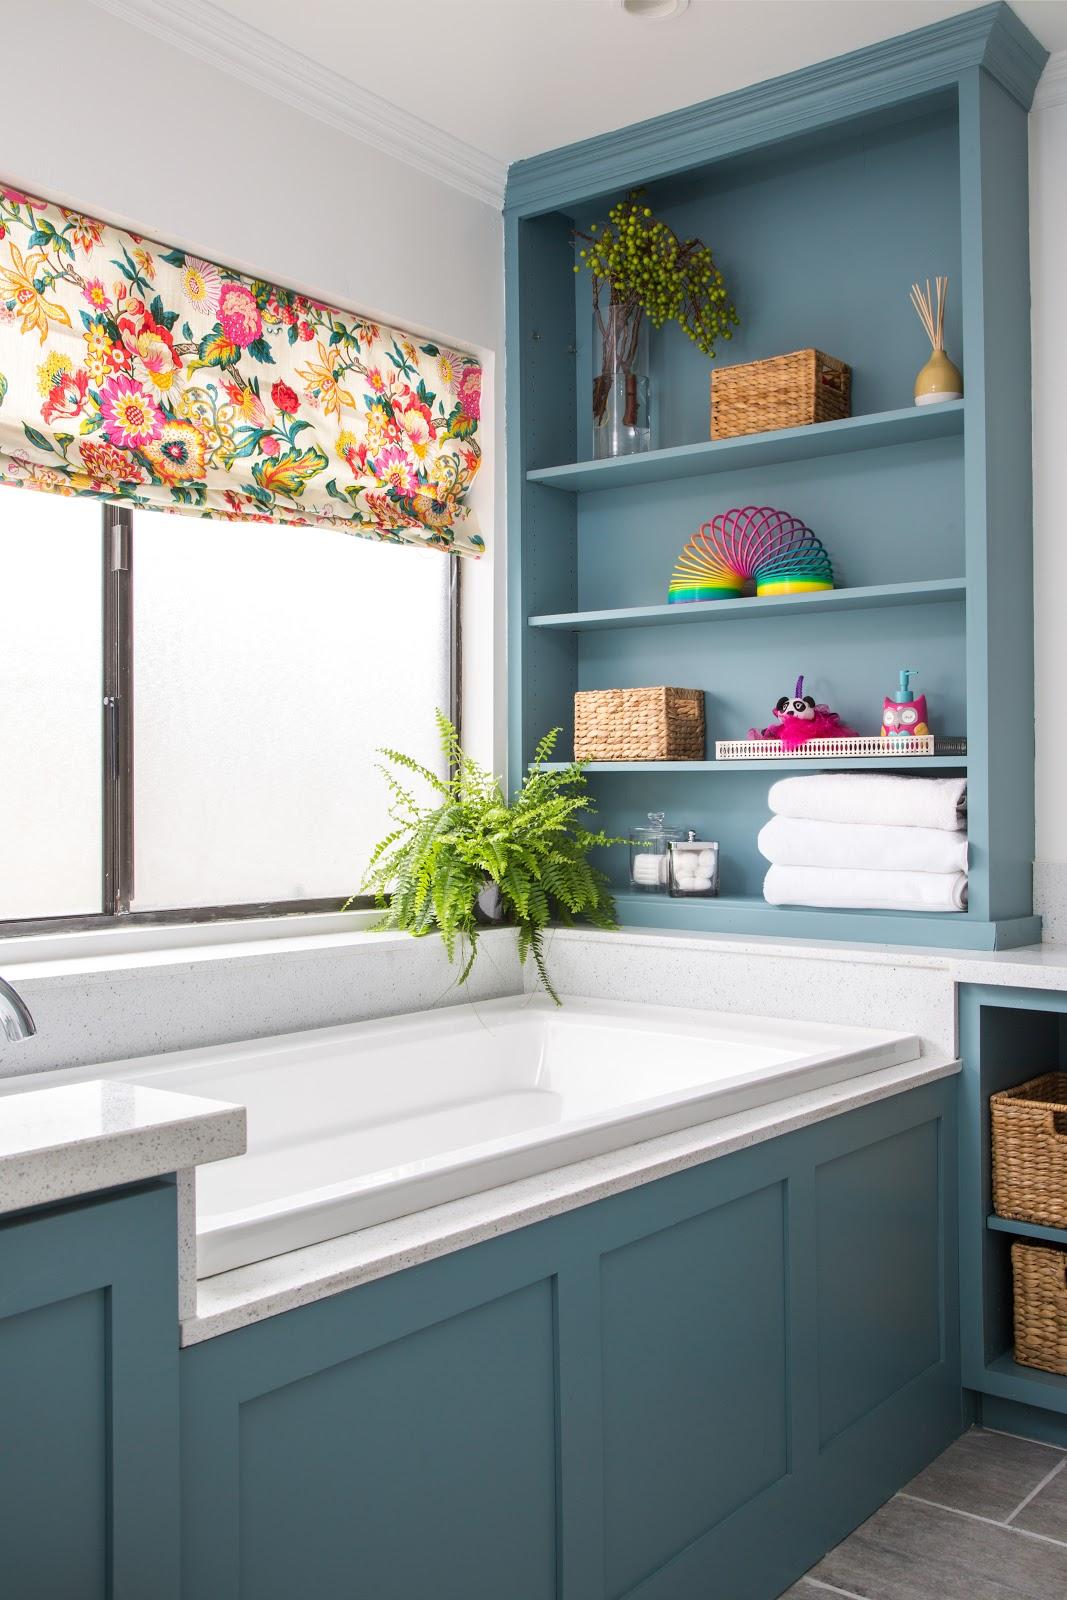 floral roman shades blue builtin shelving bathtub guest bathroom joy street design